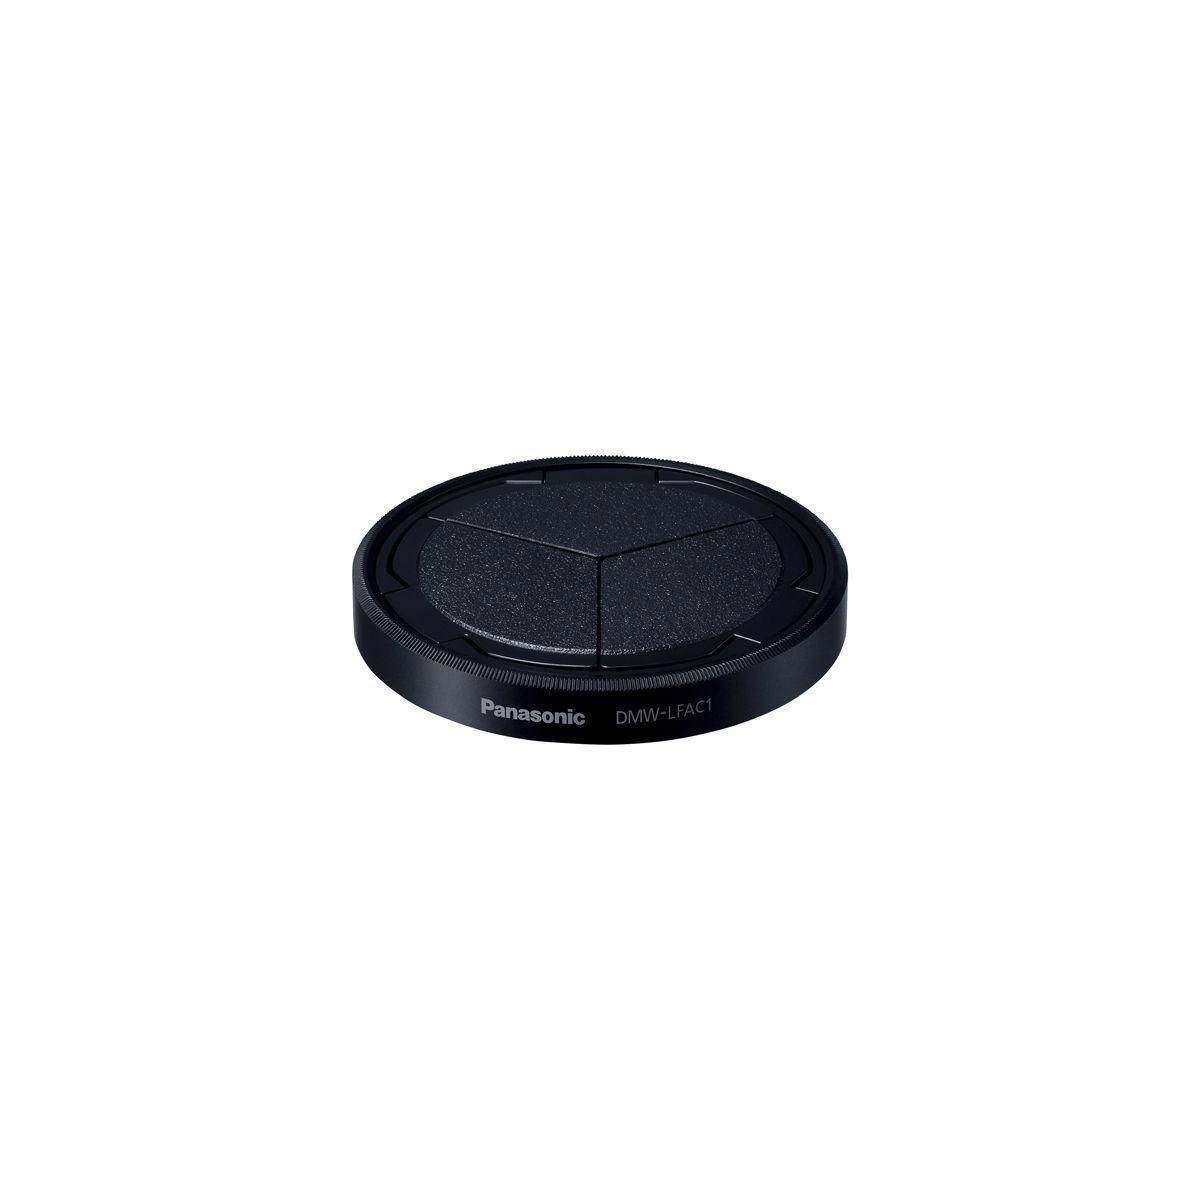 Bouchon panasonic dmw-lfac1 noir (photo)